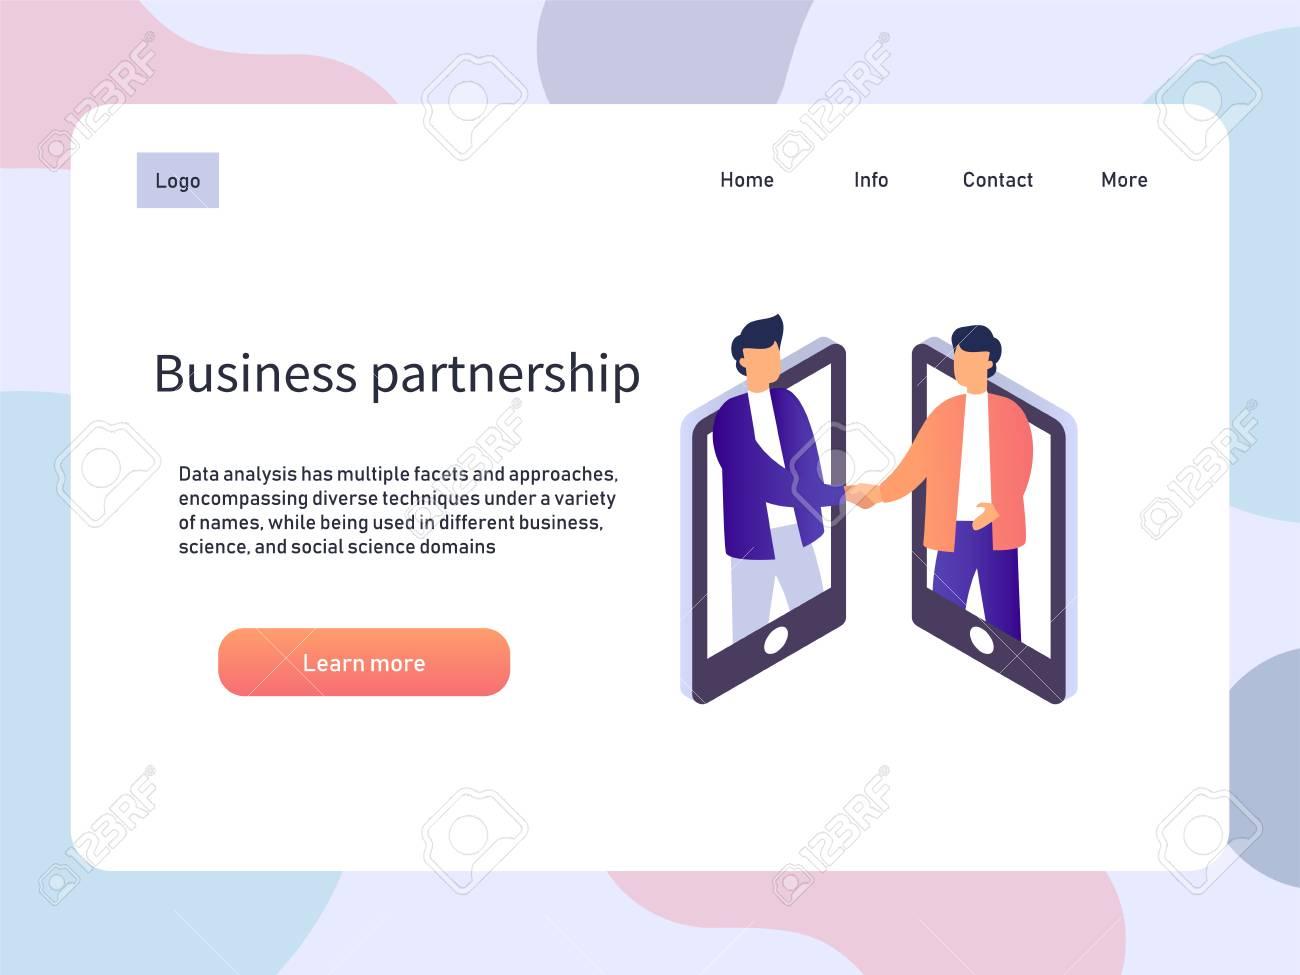 Online meeting, business partnership. People partner handshake. Vector isometric illustration - 112229646